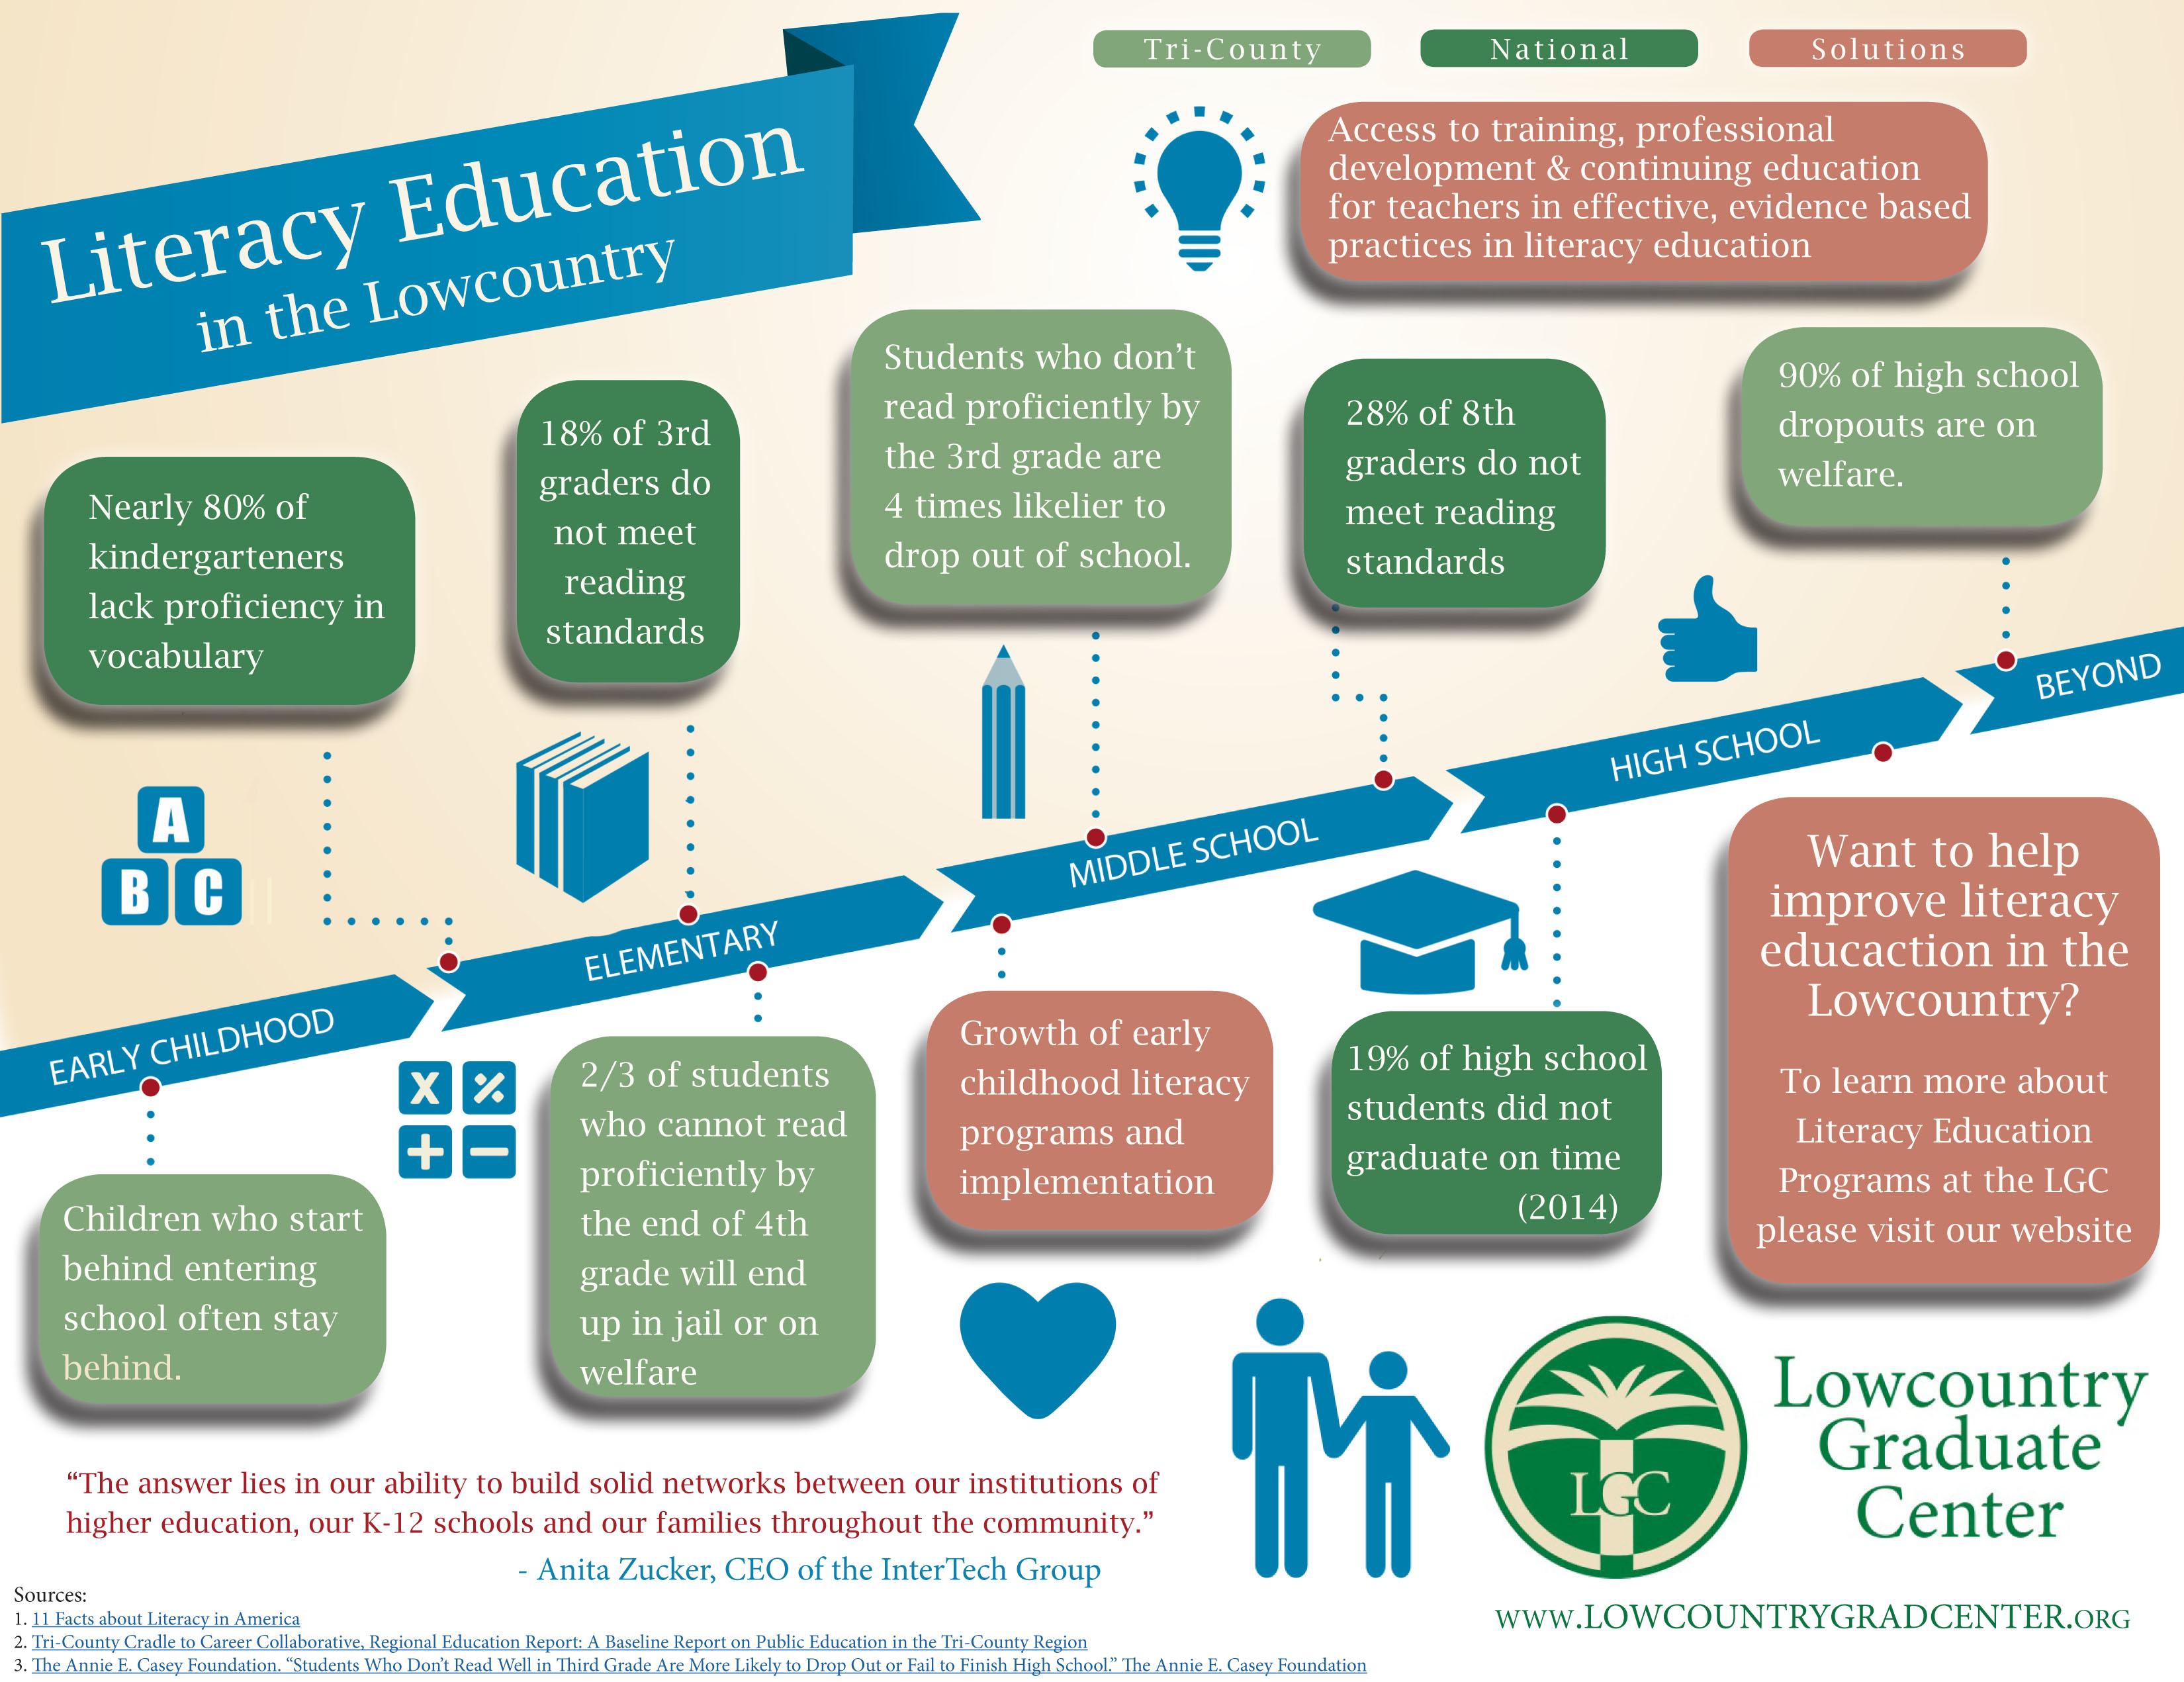 https://www.lowcountrygradcenter.org/wp-content/uploads/2015/12/Literacy-Infographic.jpg